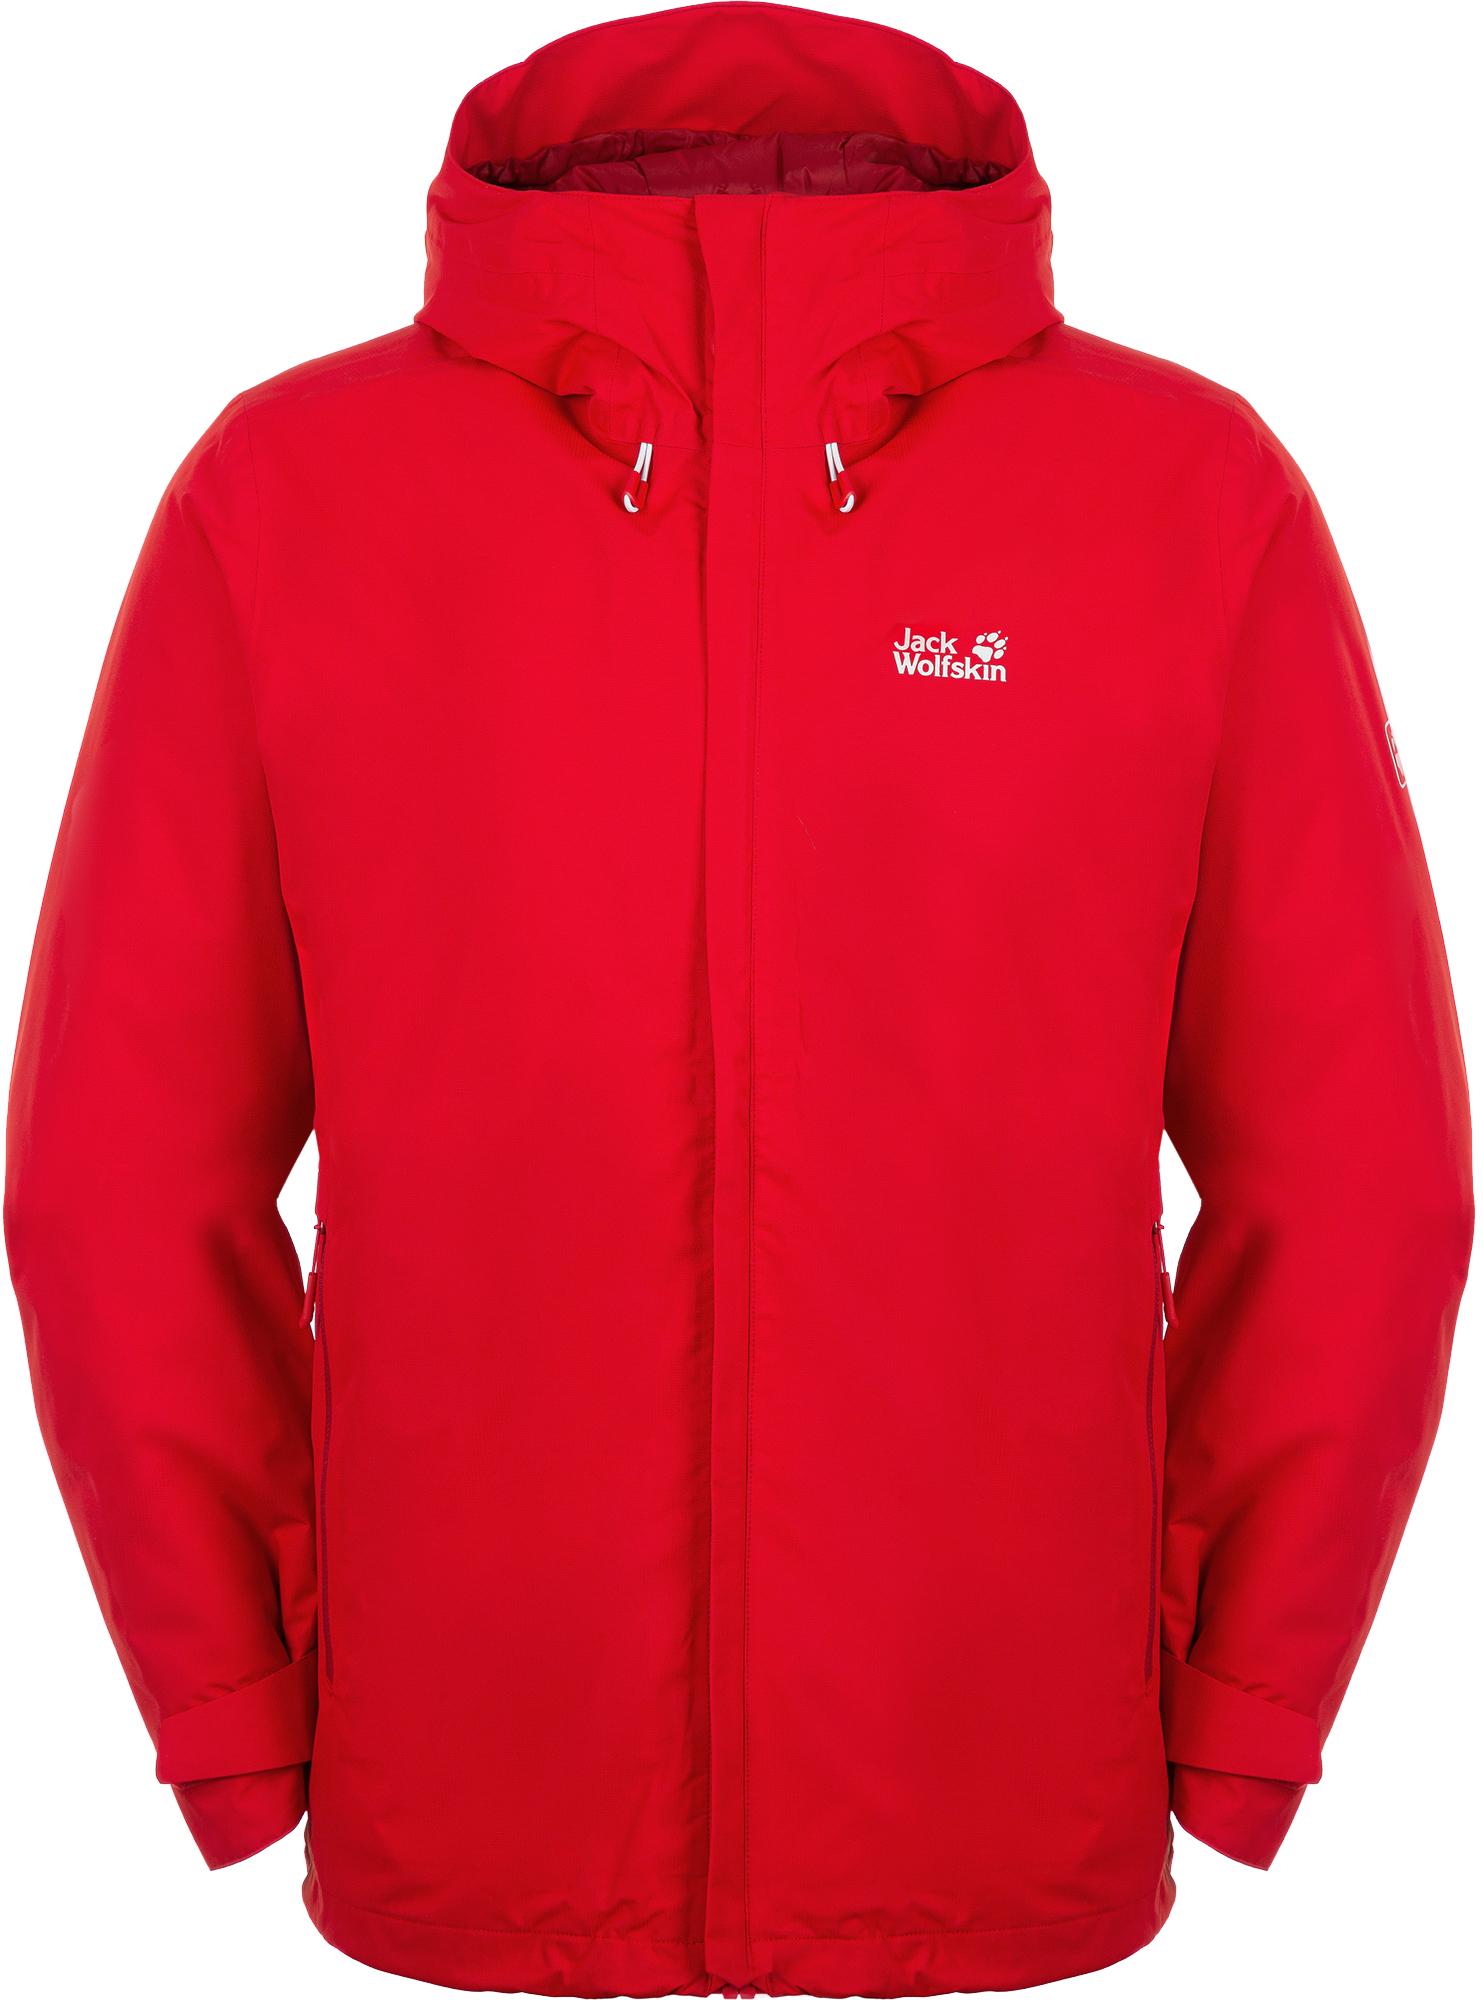 Jack Wolfskin Куртка утепленная мужская Jack Wolfskin Argon Storm, размер 54-56